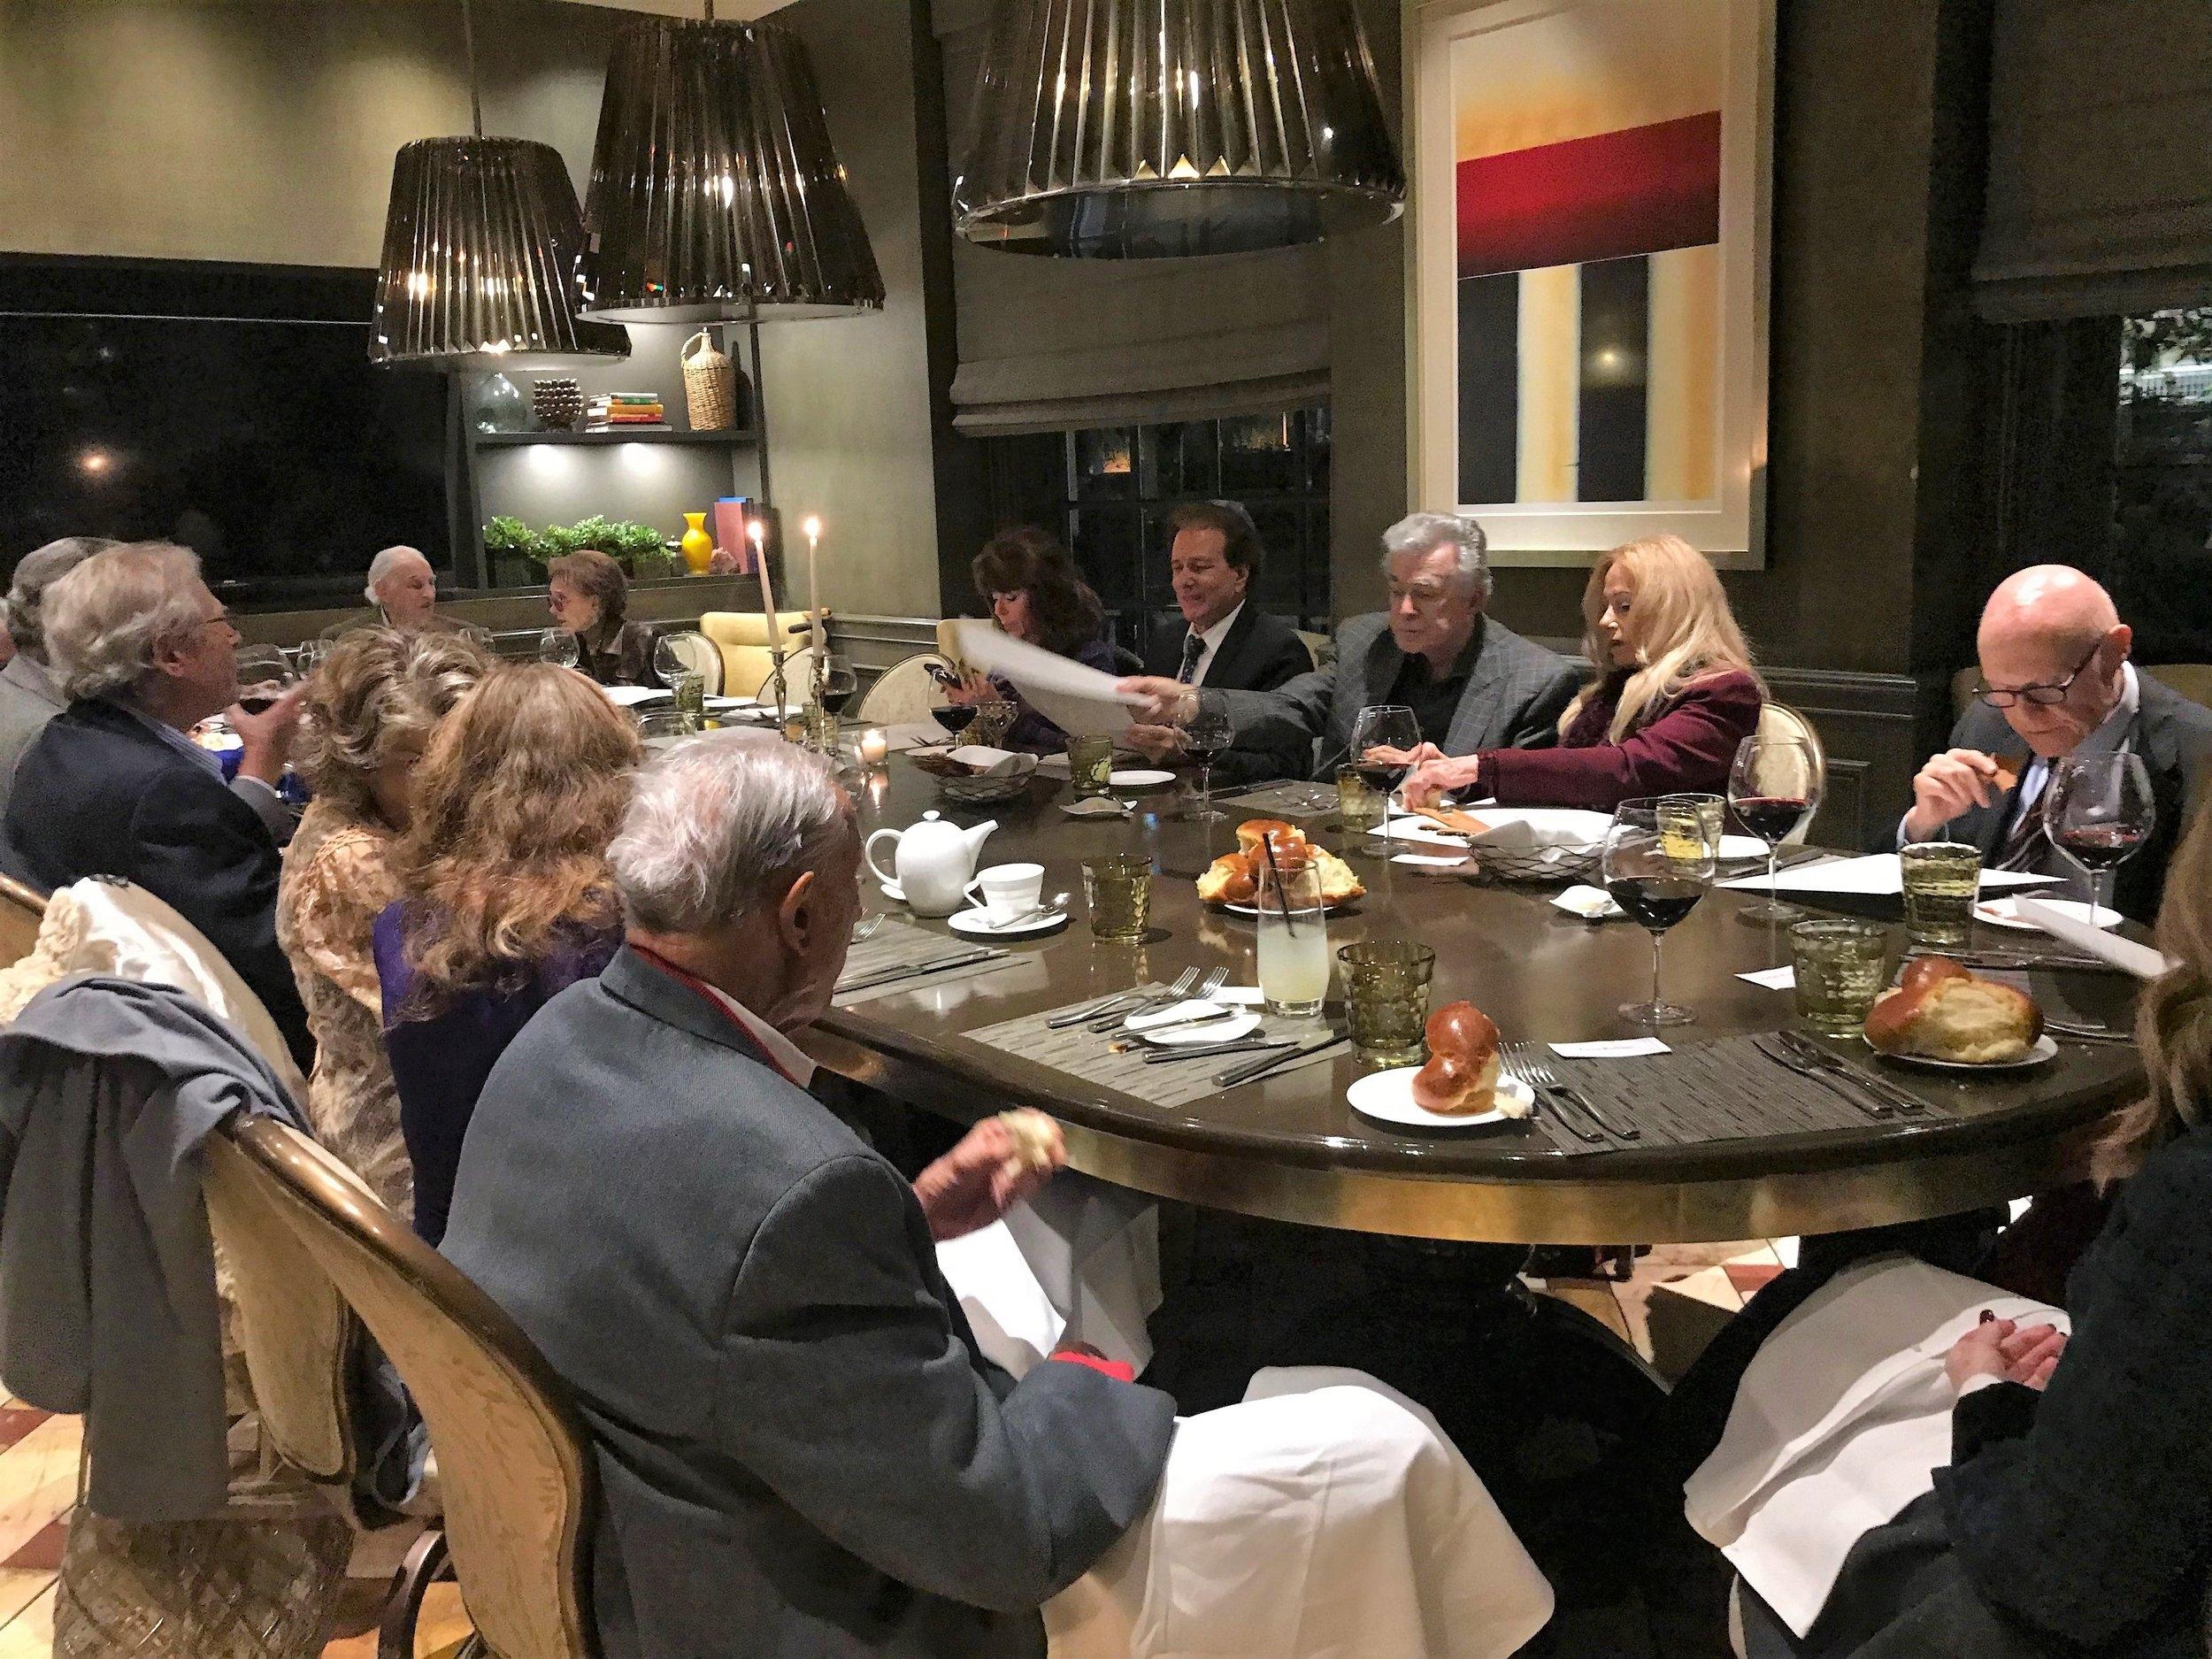 Shabbat Dinner at Culina Four Seasons - 1/12/18